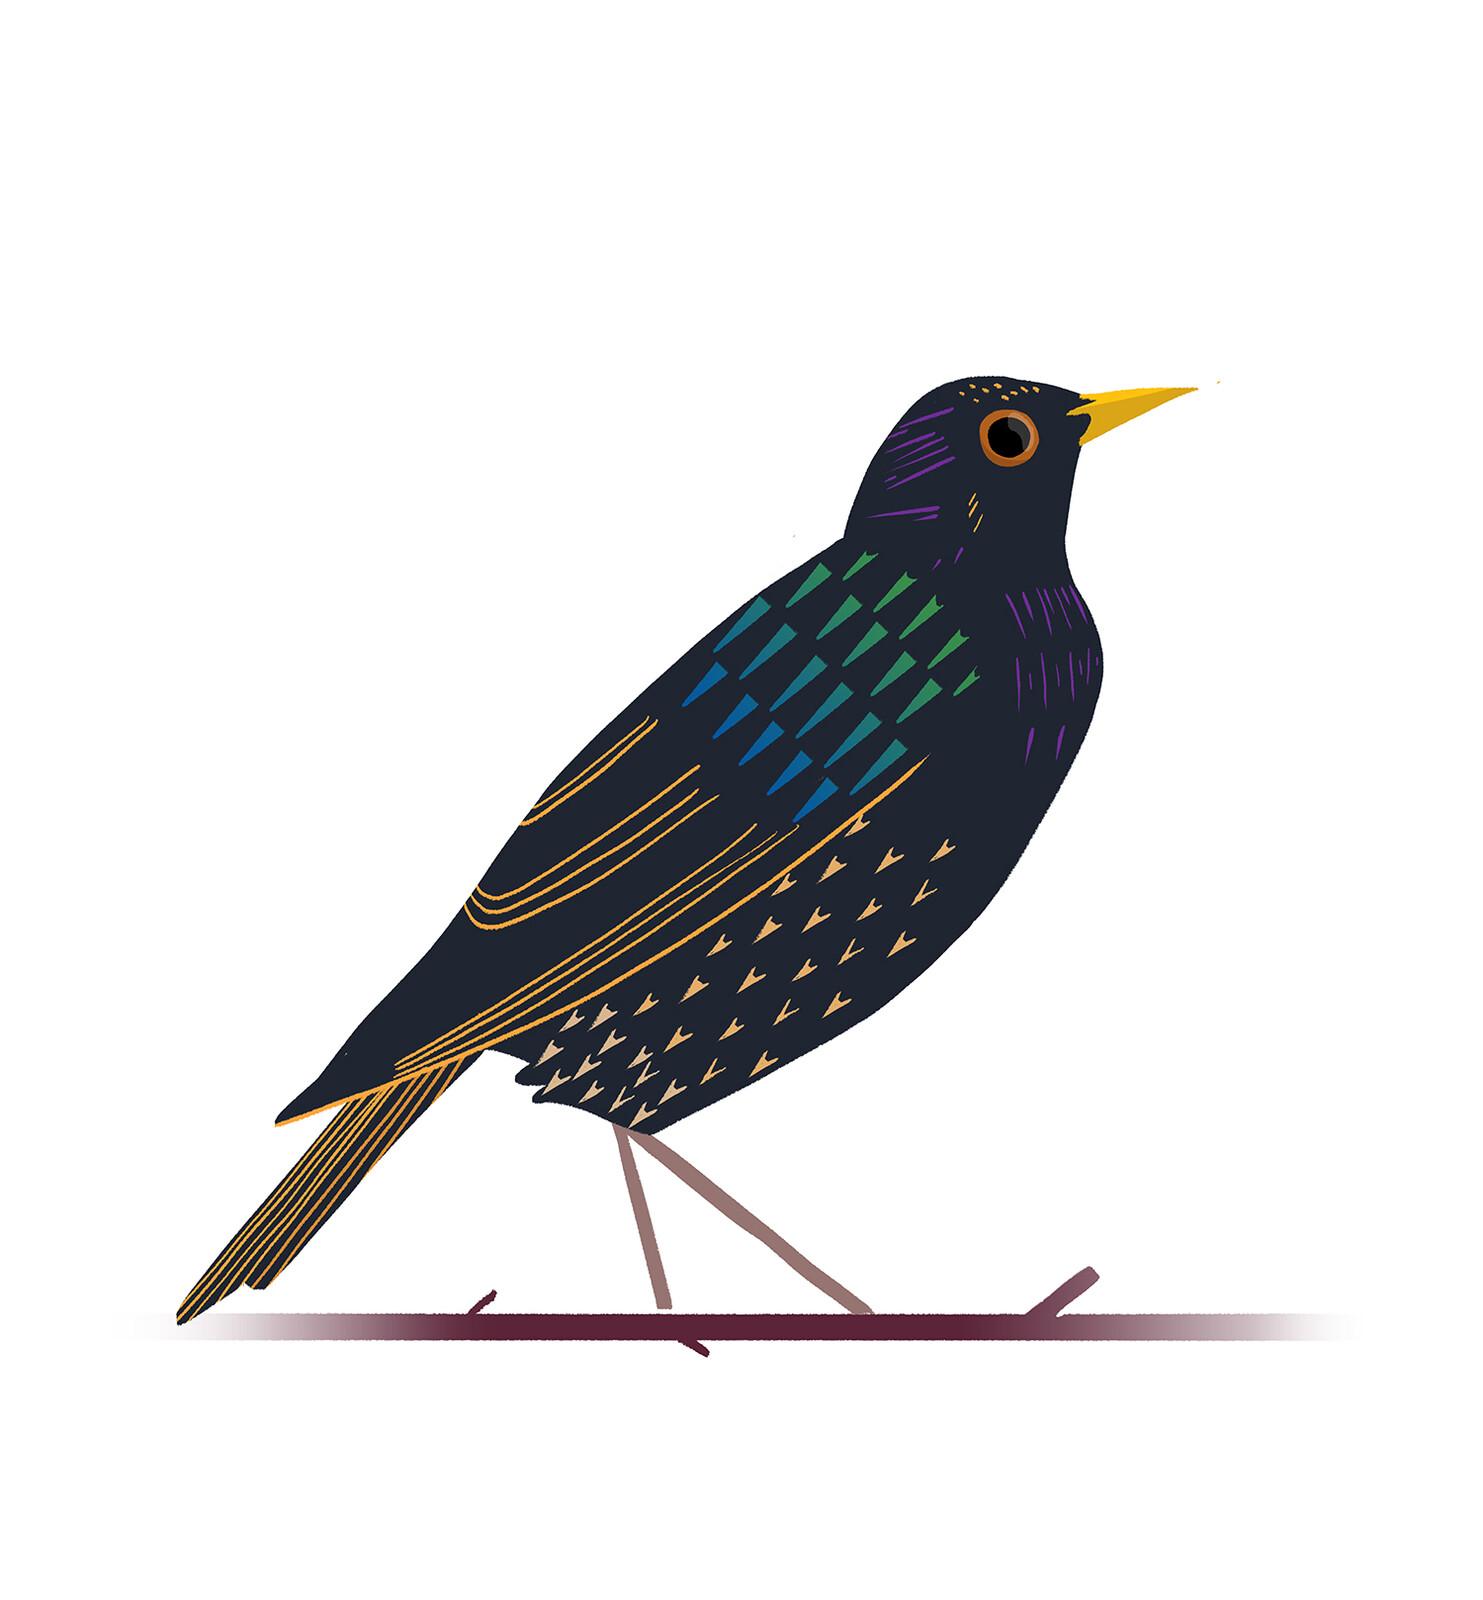 Album: Natural history illustration